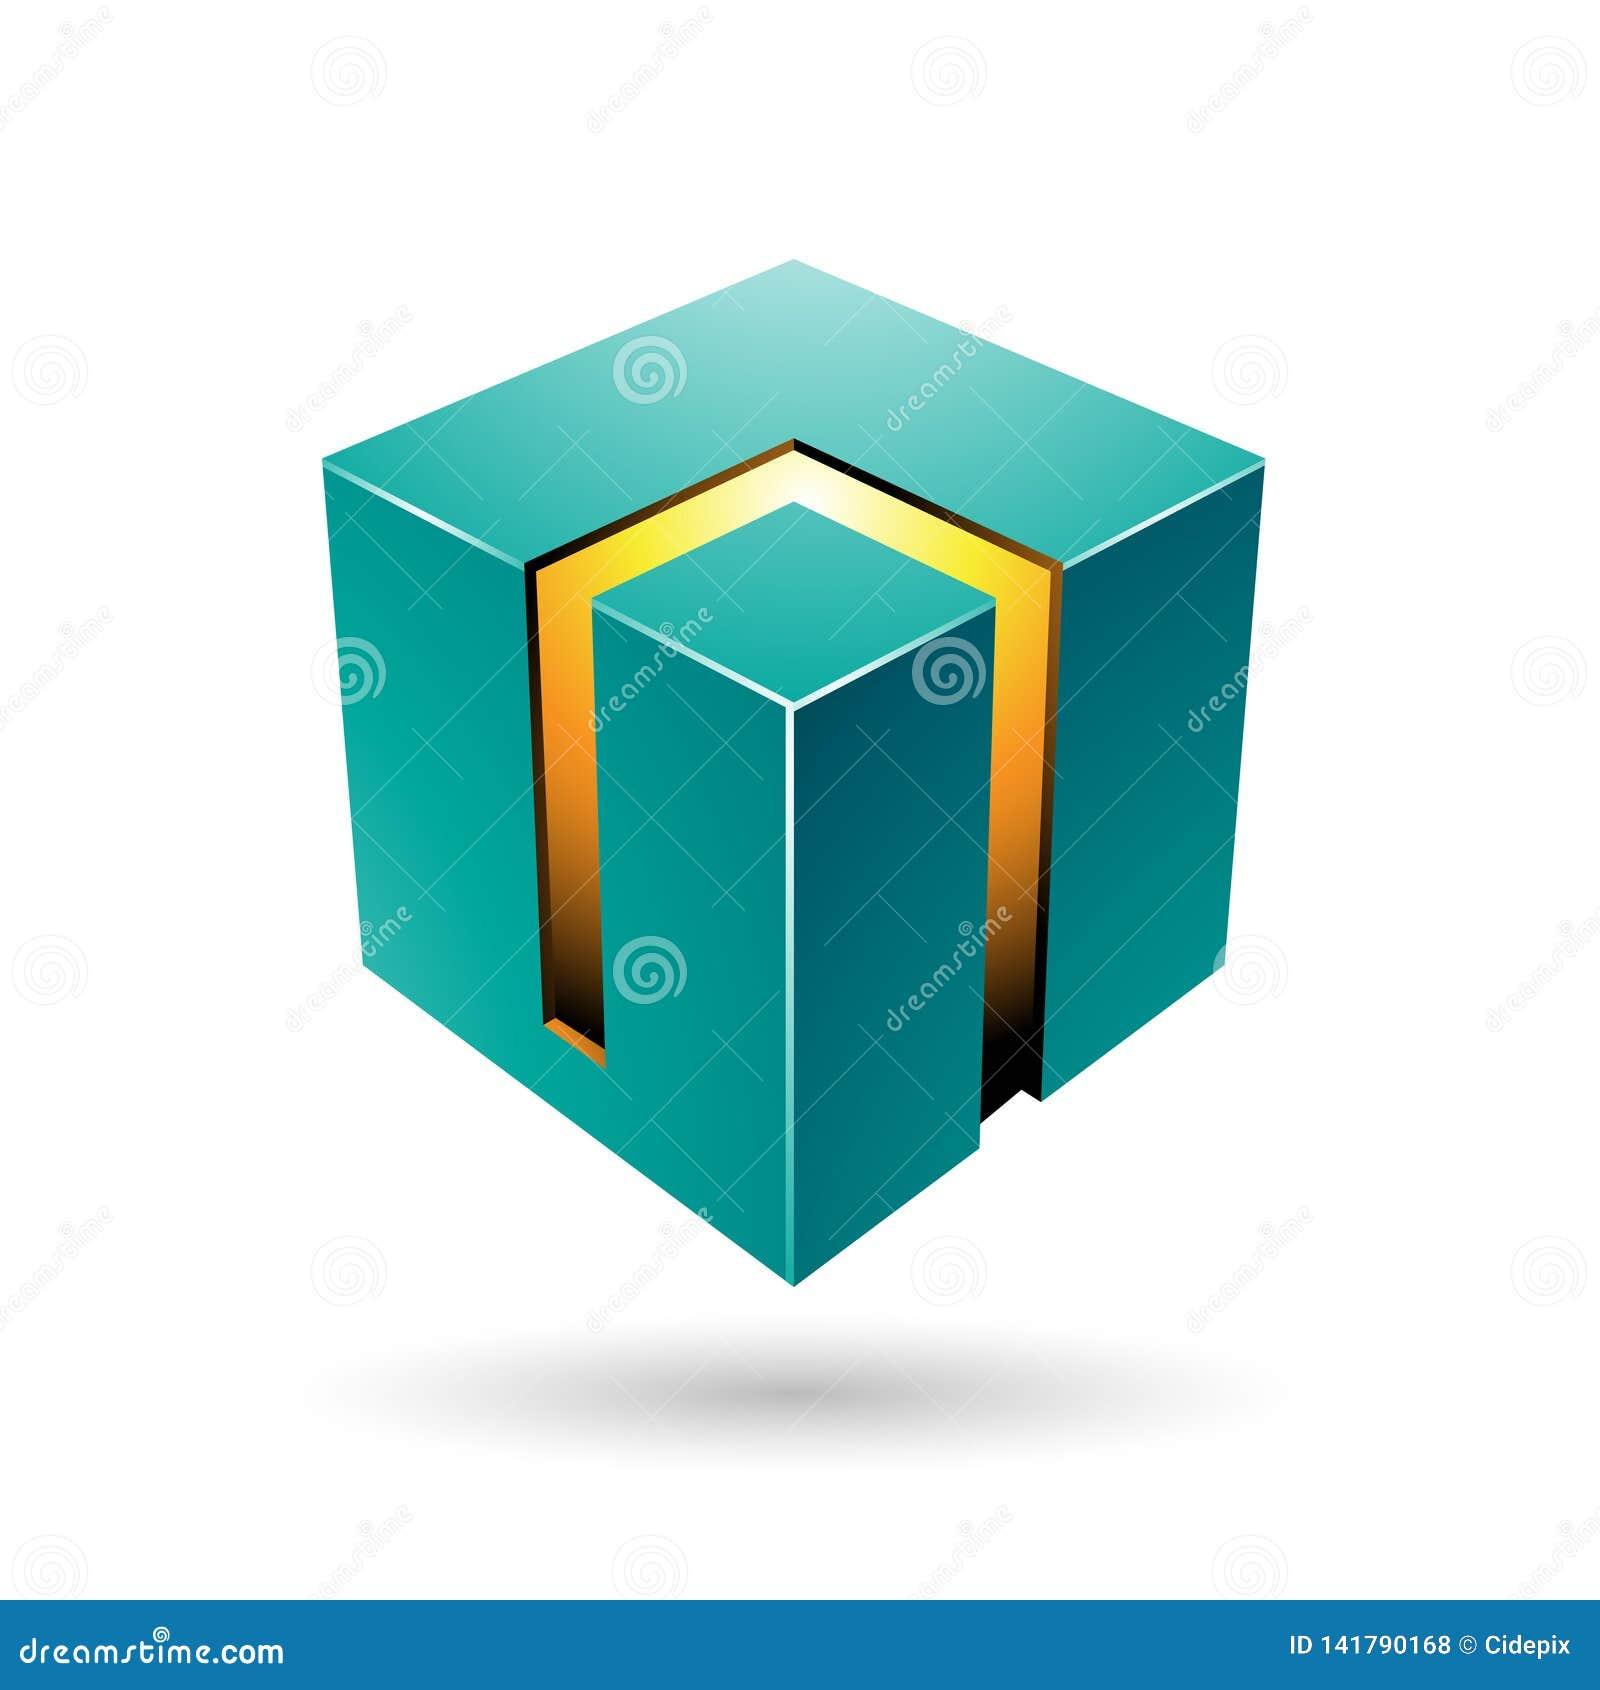 Cubo audace verde e giallo 3d